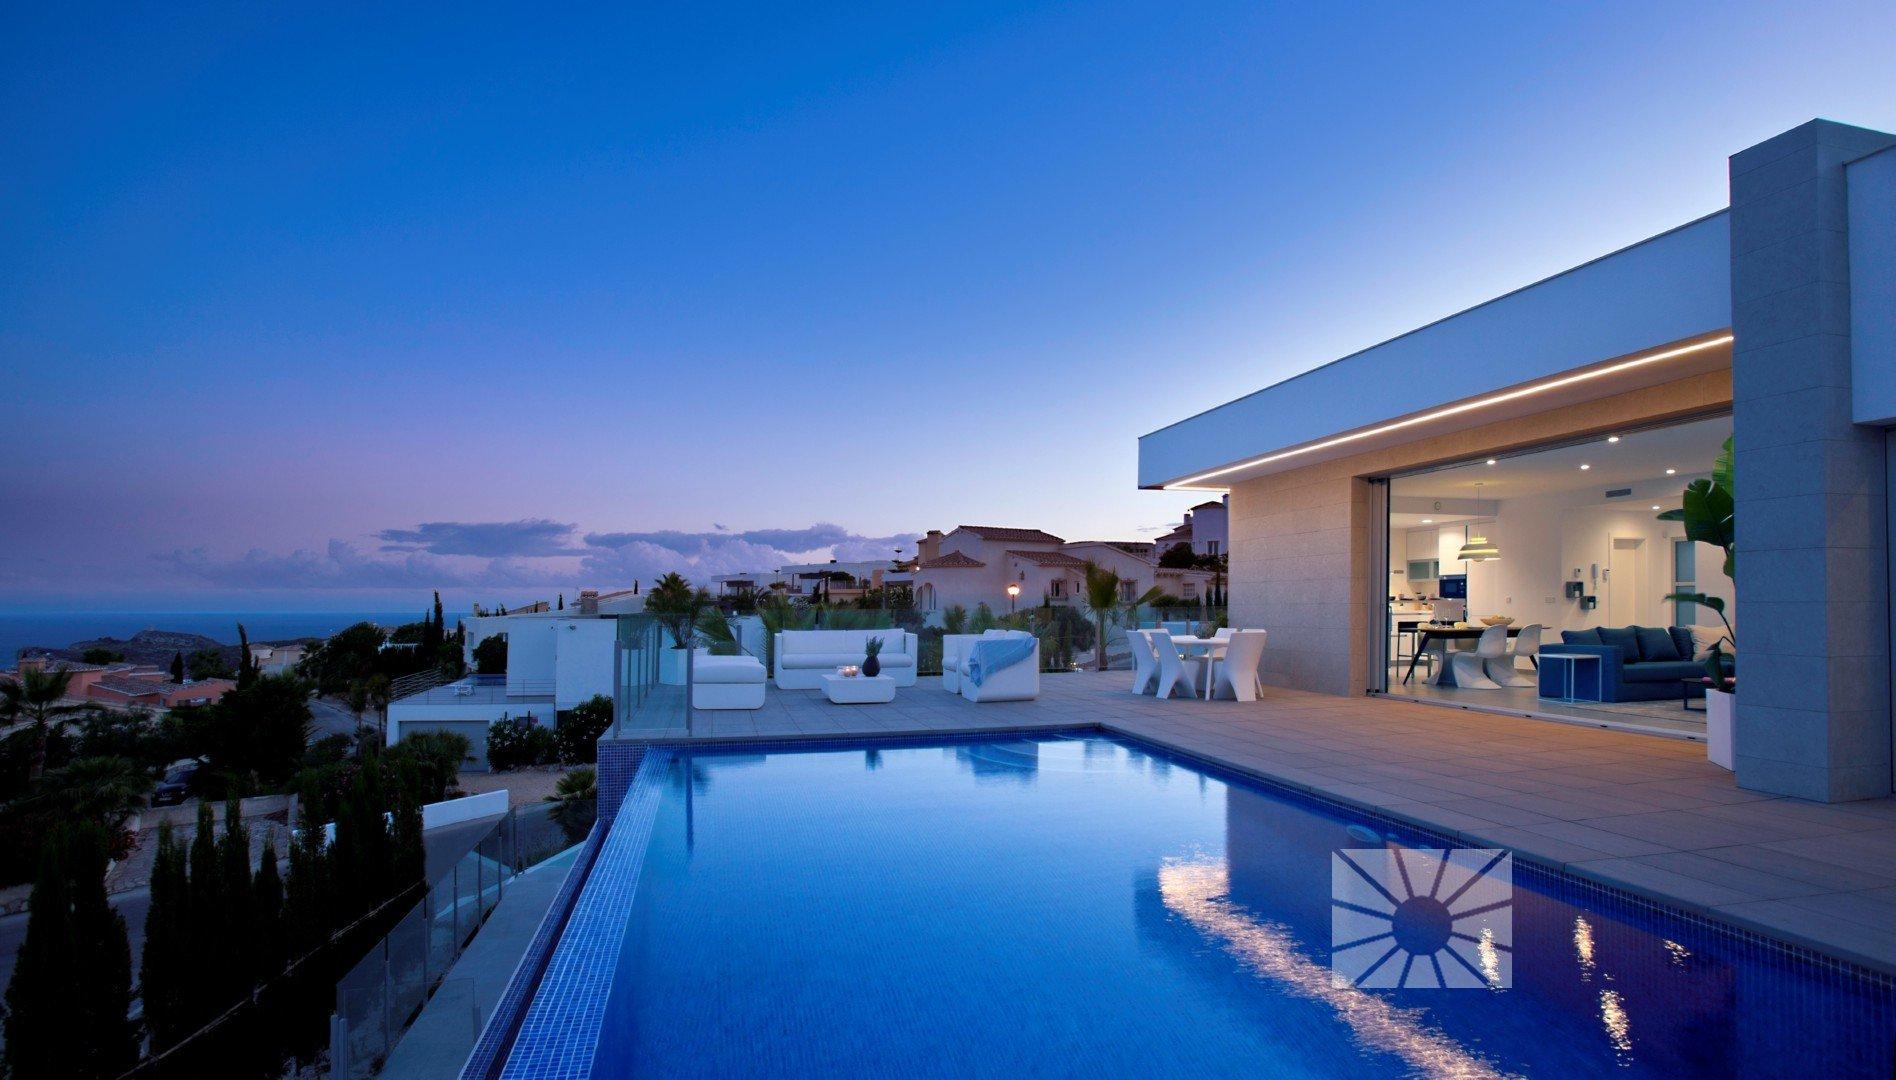 Lirios Design Modern Villas For Sale In Cumbre Del Sol